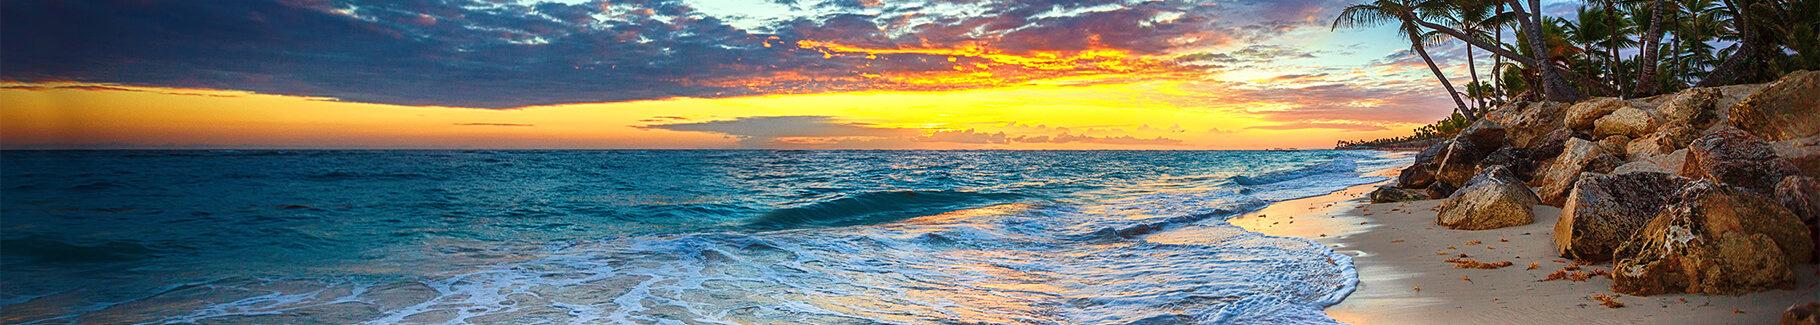 Plakat wschód słońca nad morzem